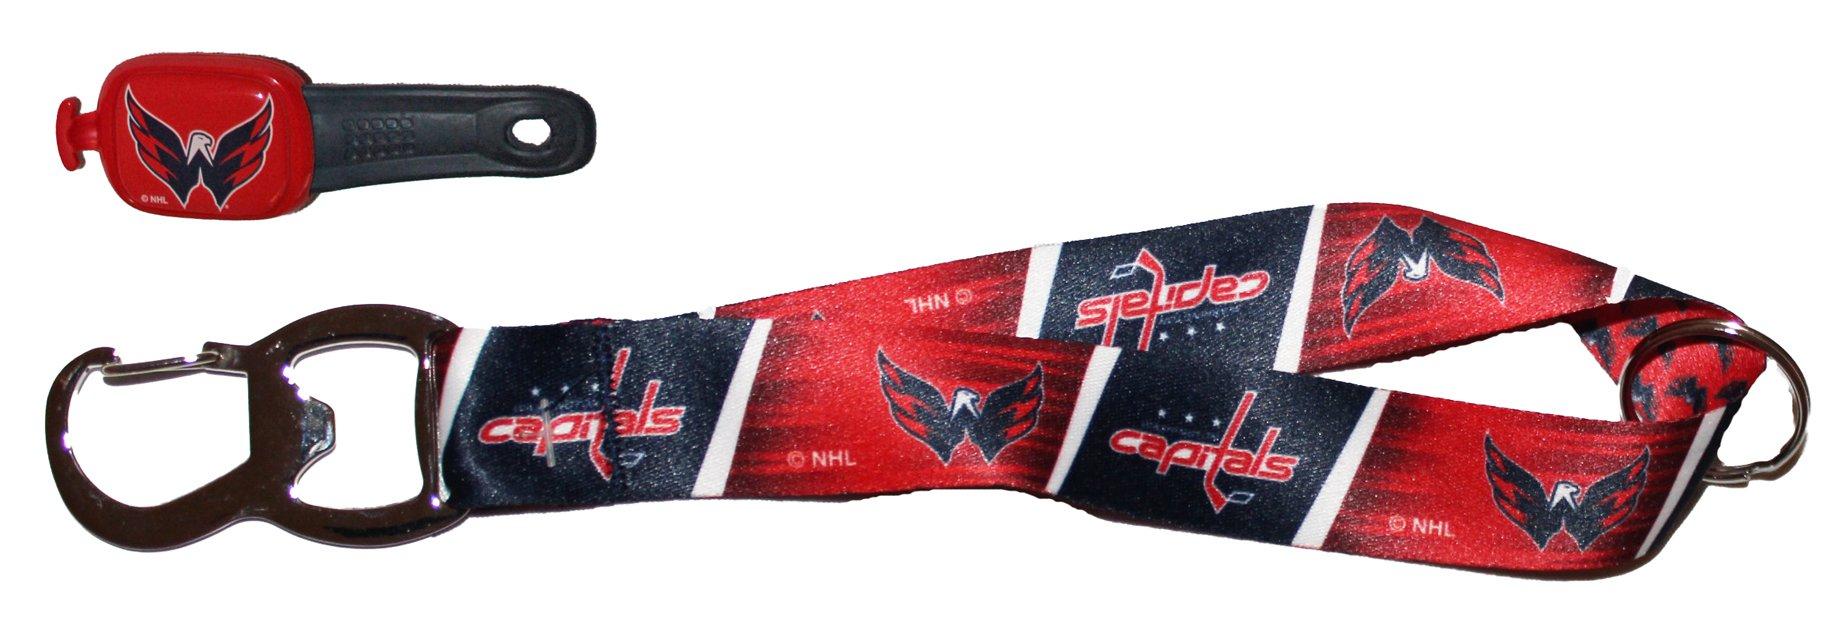 WinCraft Bundle 2 Items: NHL Washington Capitals 1 Bottle Opener Key Strap and 1 Stwrap Bag Id Tag